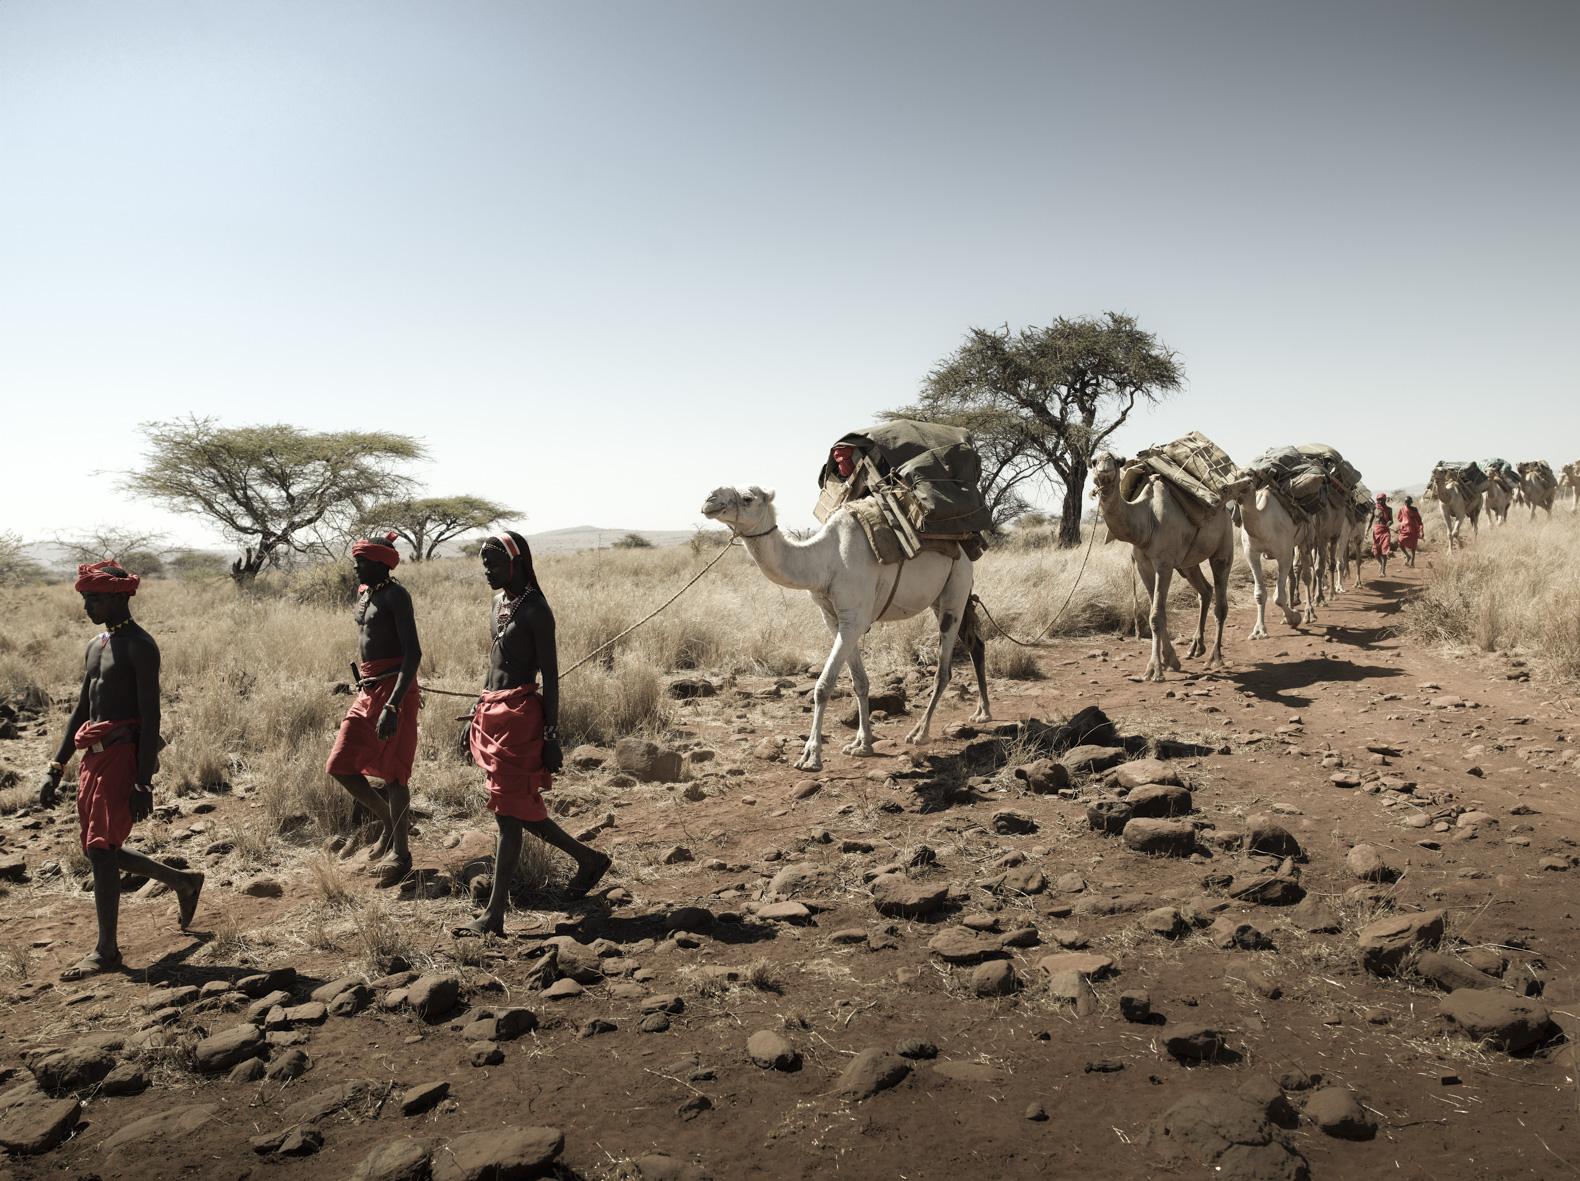 David Crookes | Kenya